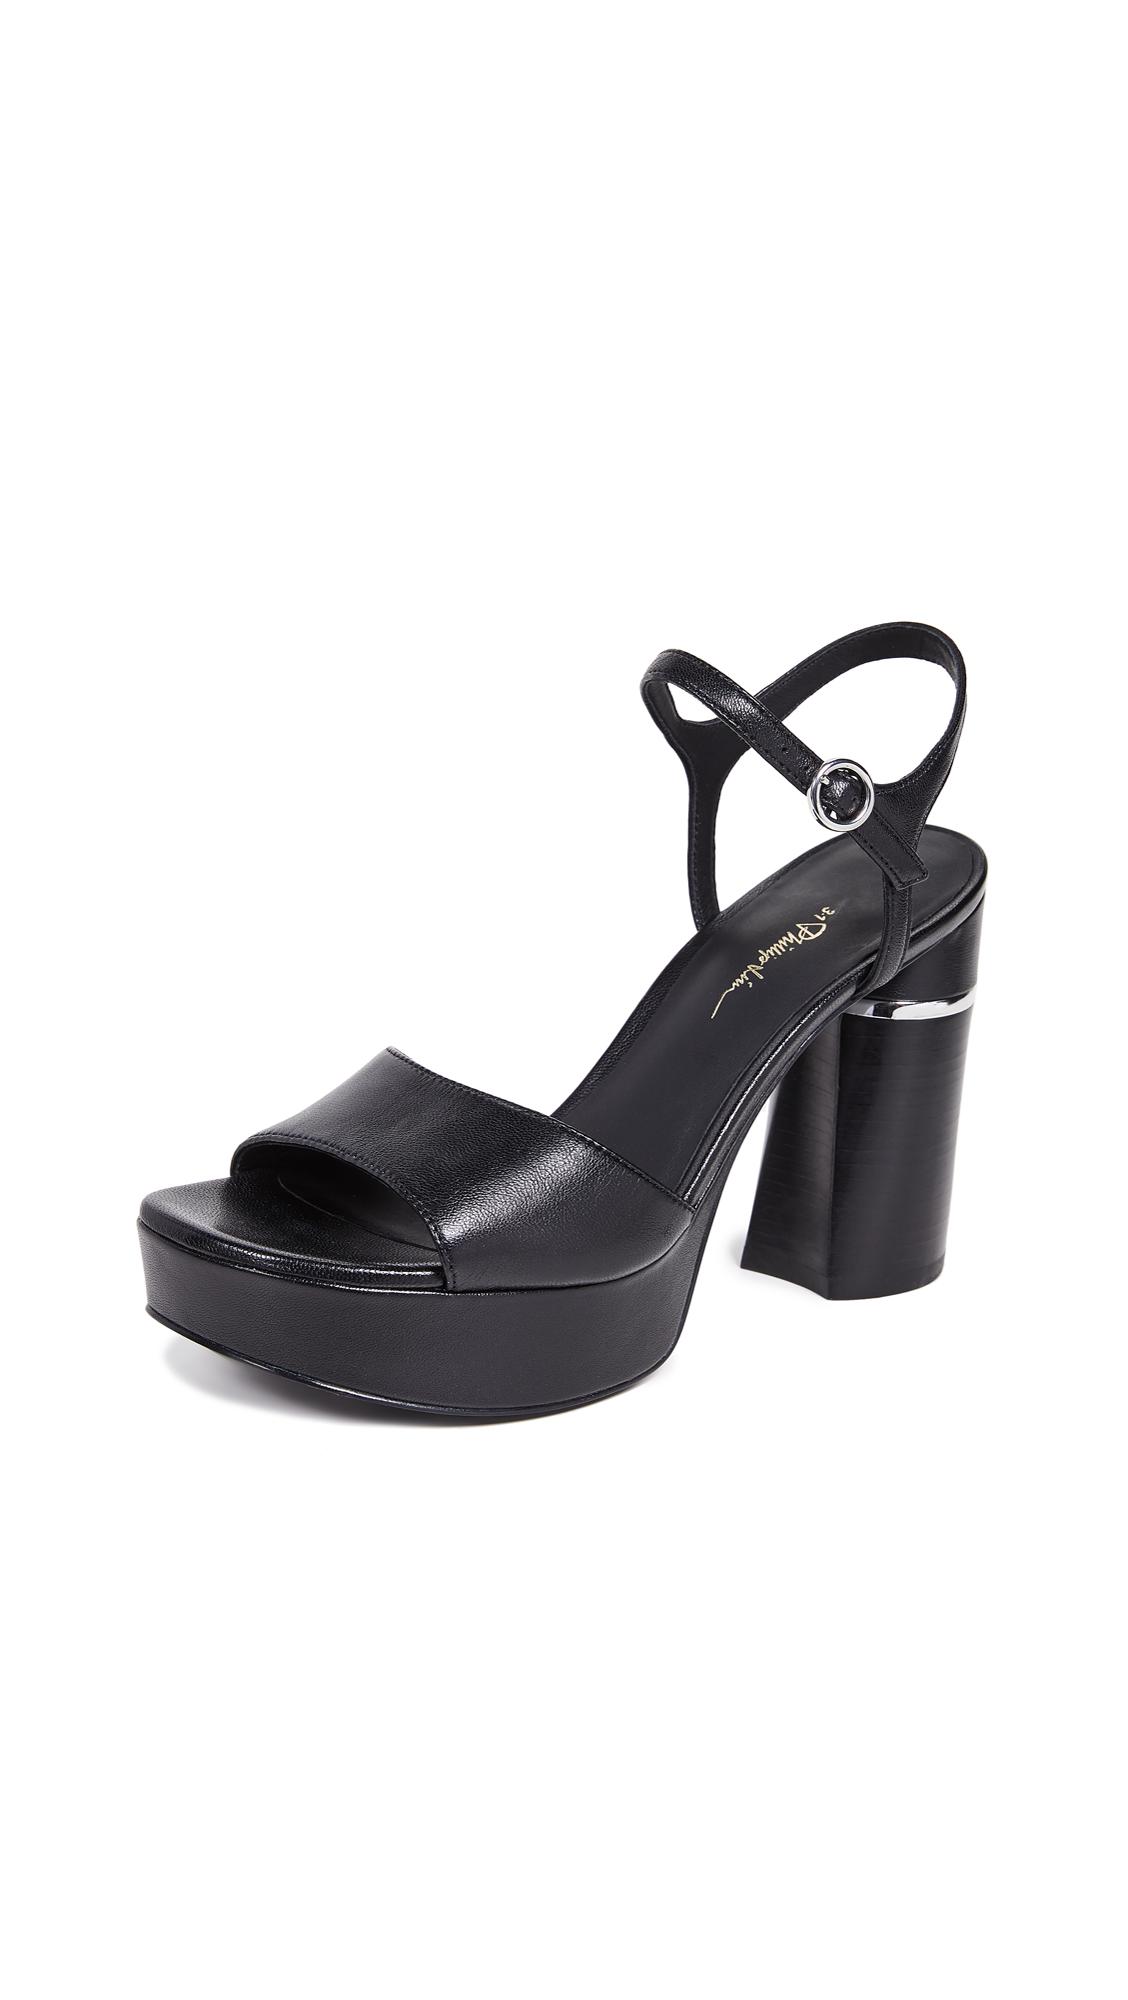 3.1 Phillip Lim Ziggy Platform Sandals - Black